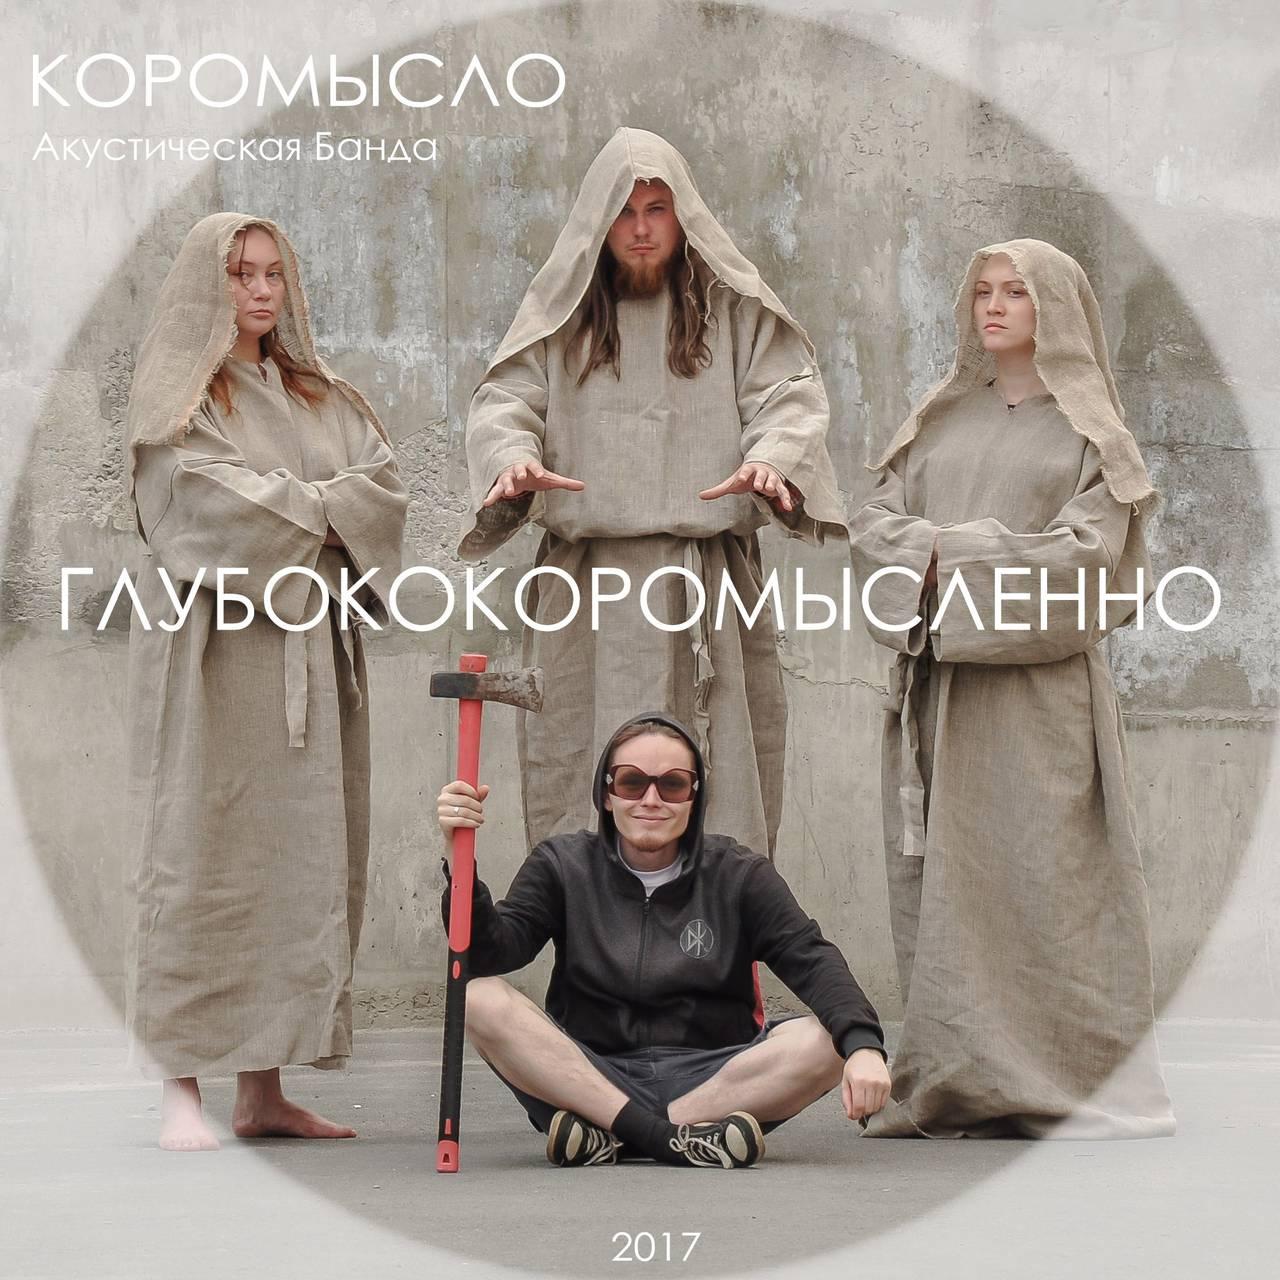 http://s3.uploads.ru/jWm50.jpg